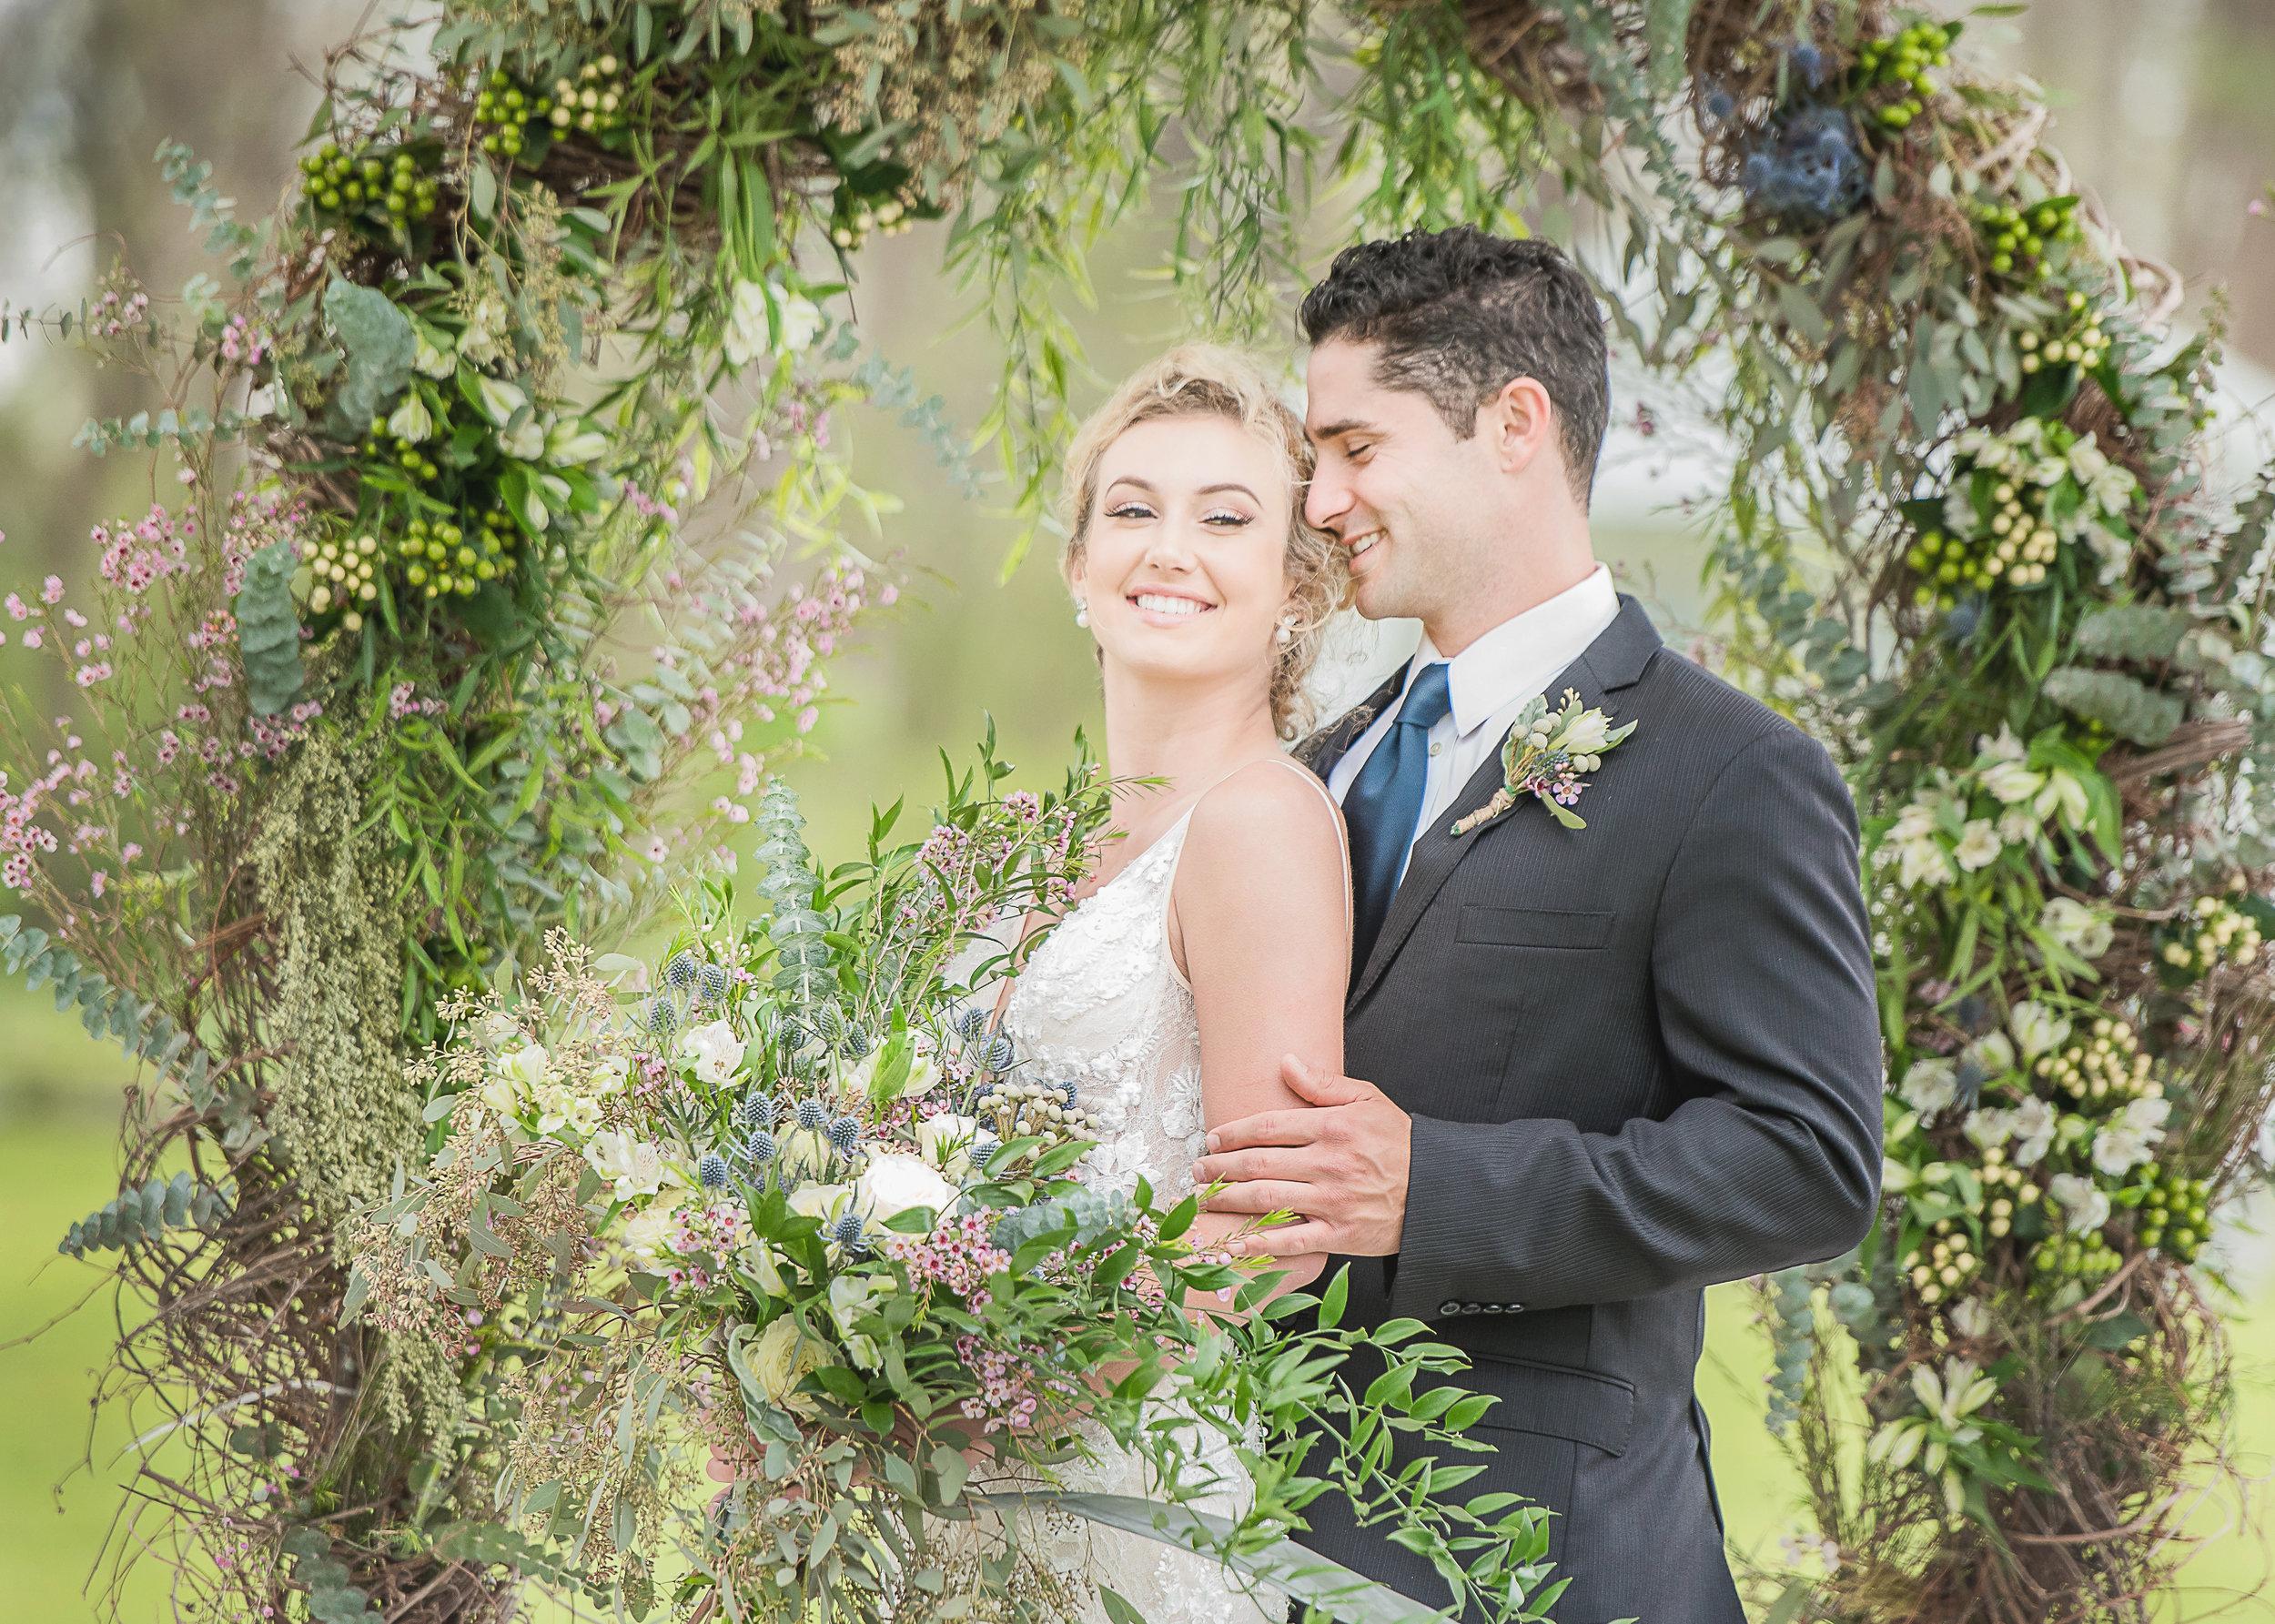 flower wreath outdoor wedding photoshoot floral lace simple modern wedding gown under $1000